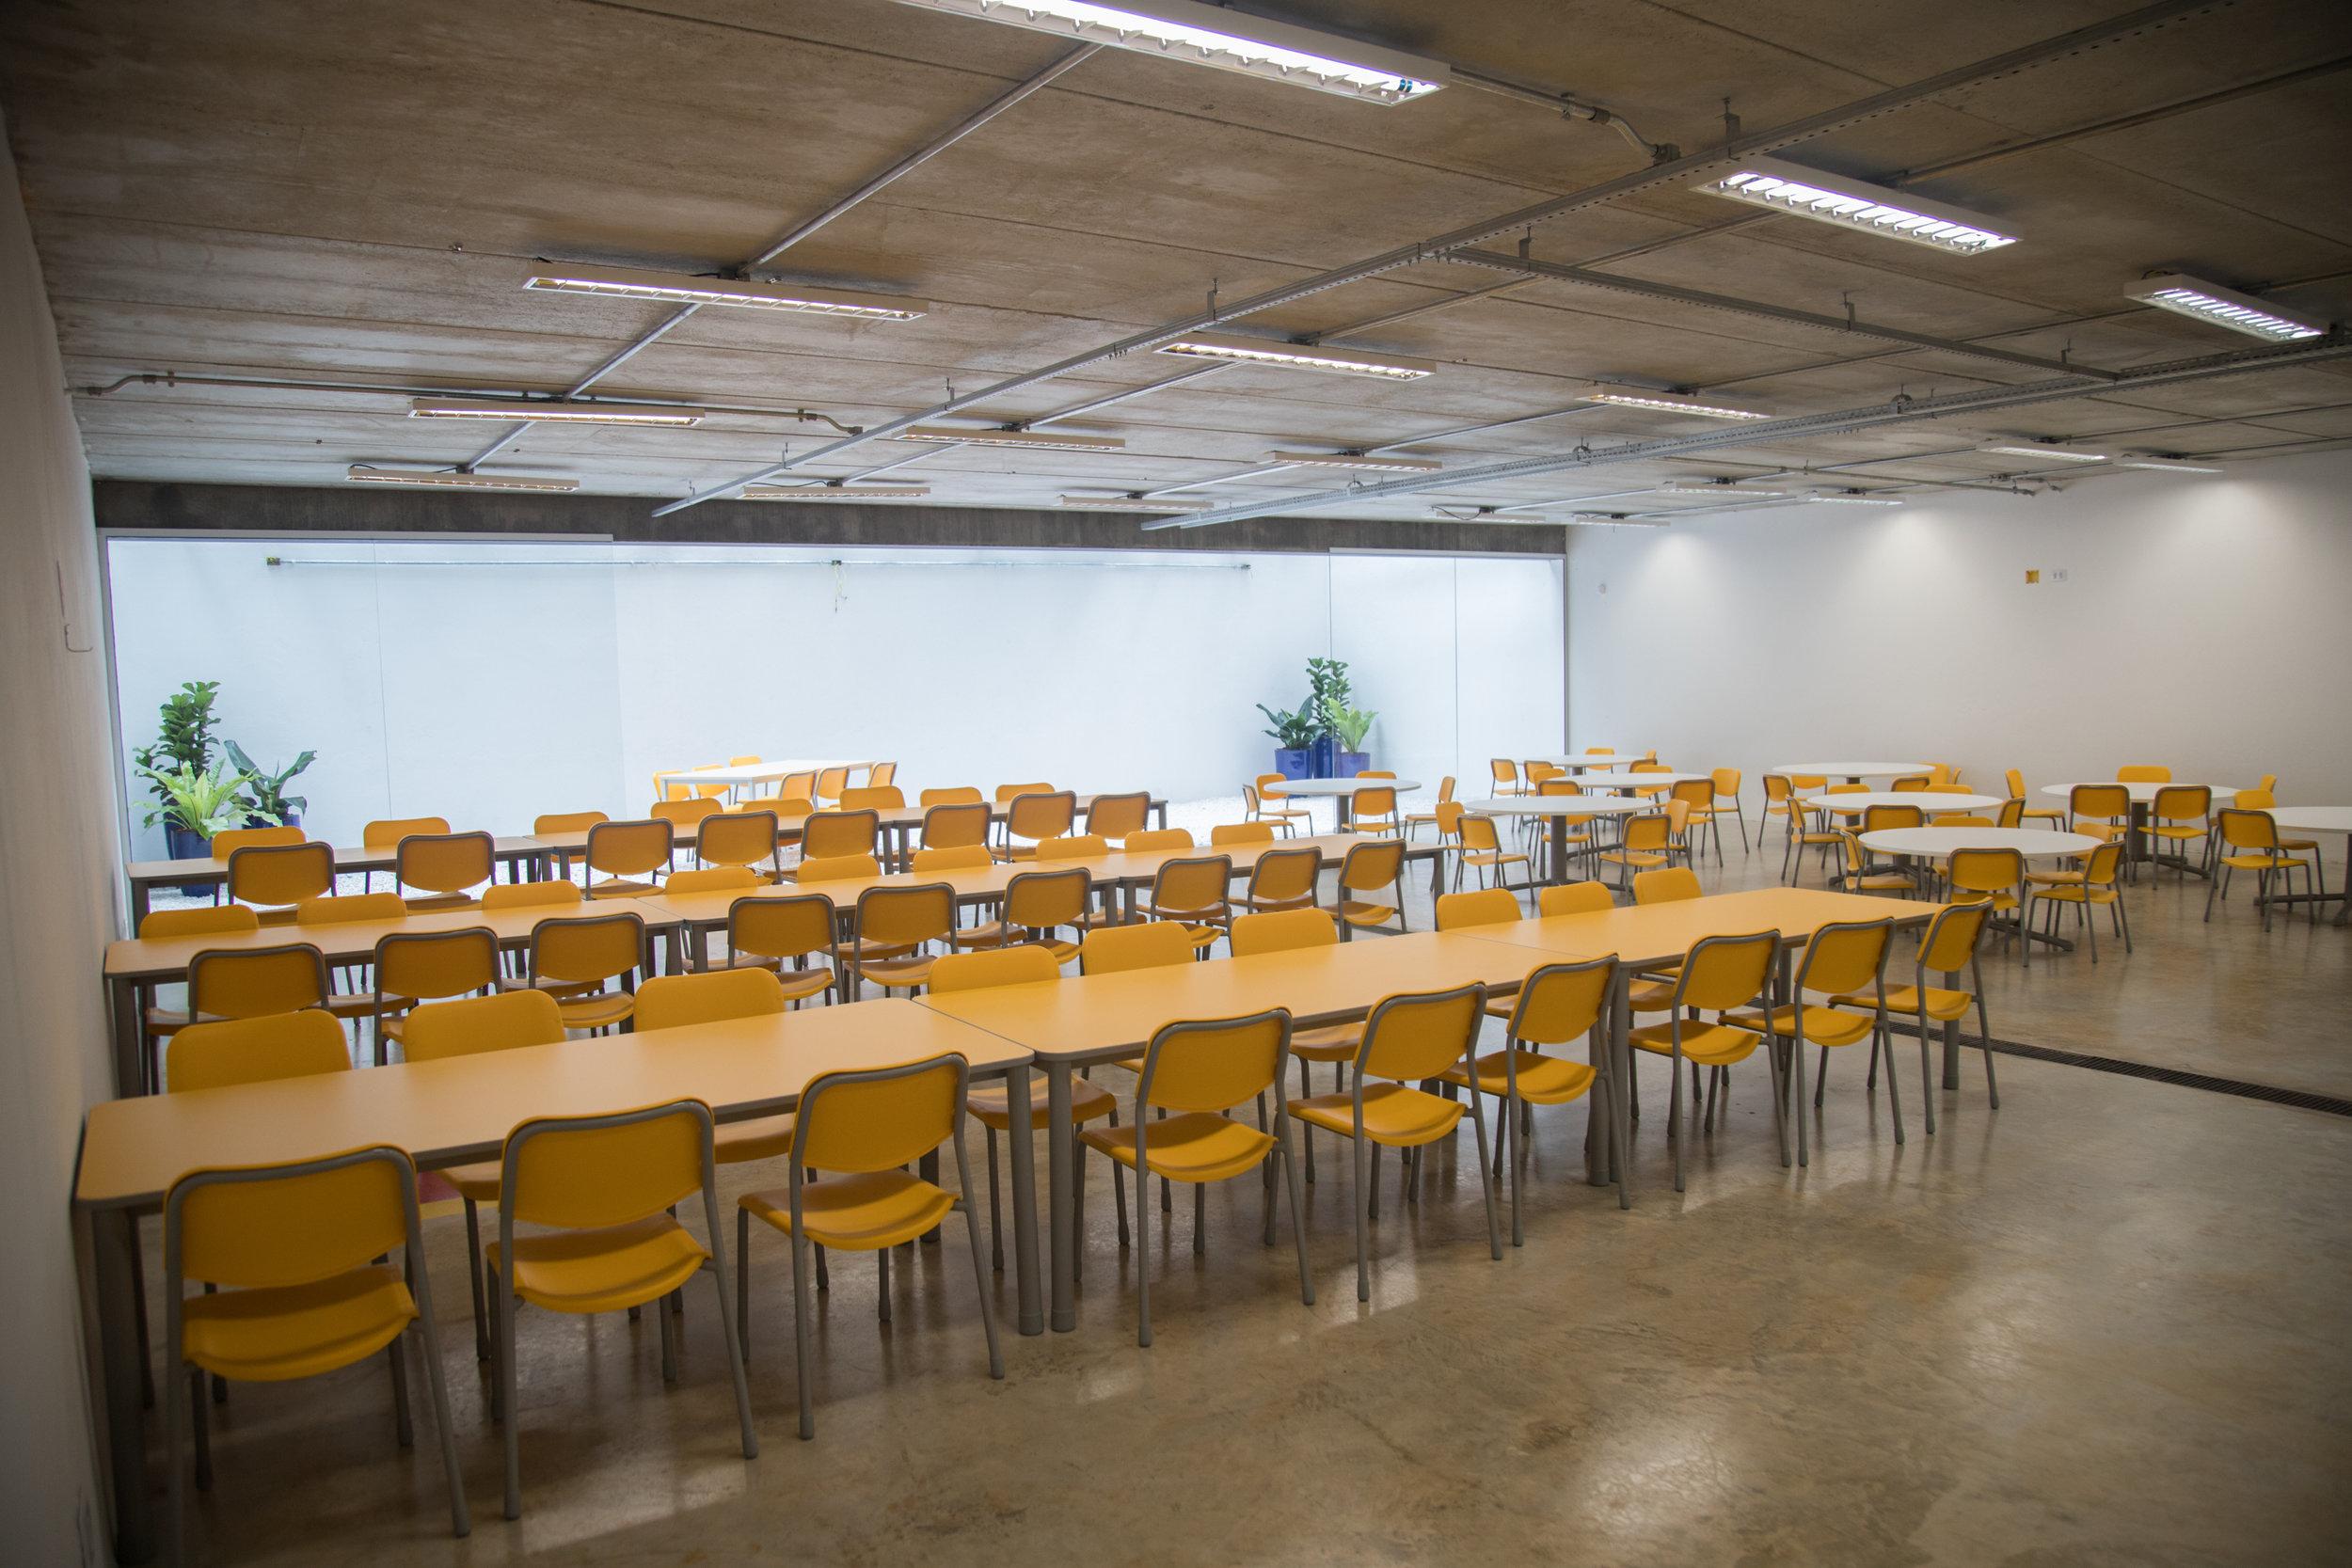 FOTOS - THE INTERNATIONAL SCHOOL OF SÃO PAULO 47.jpg